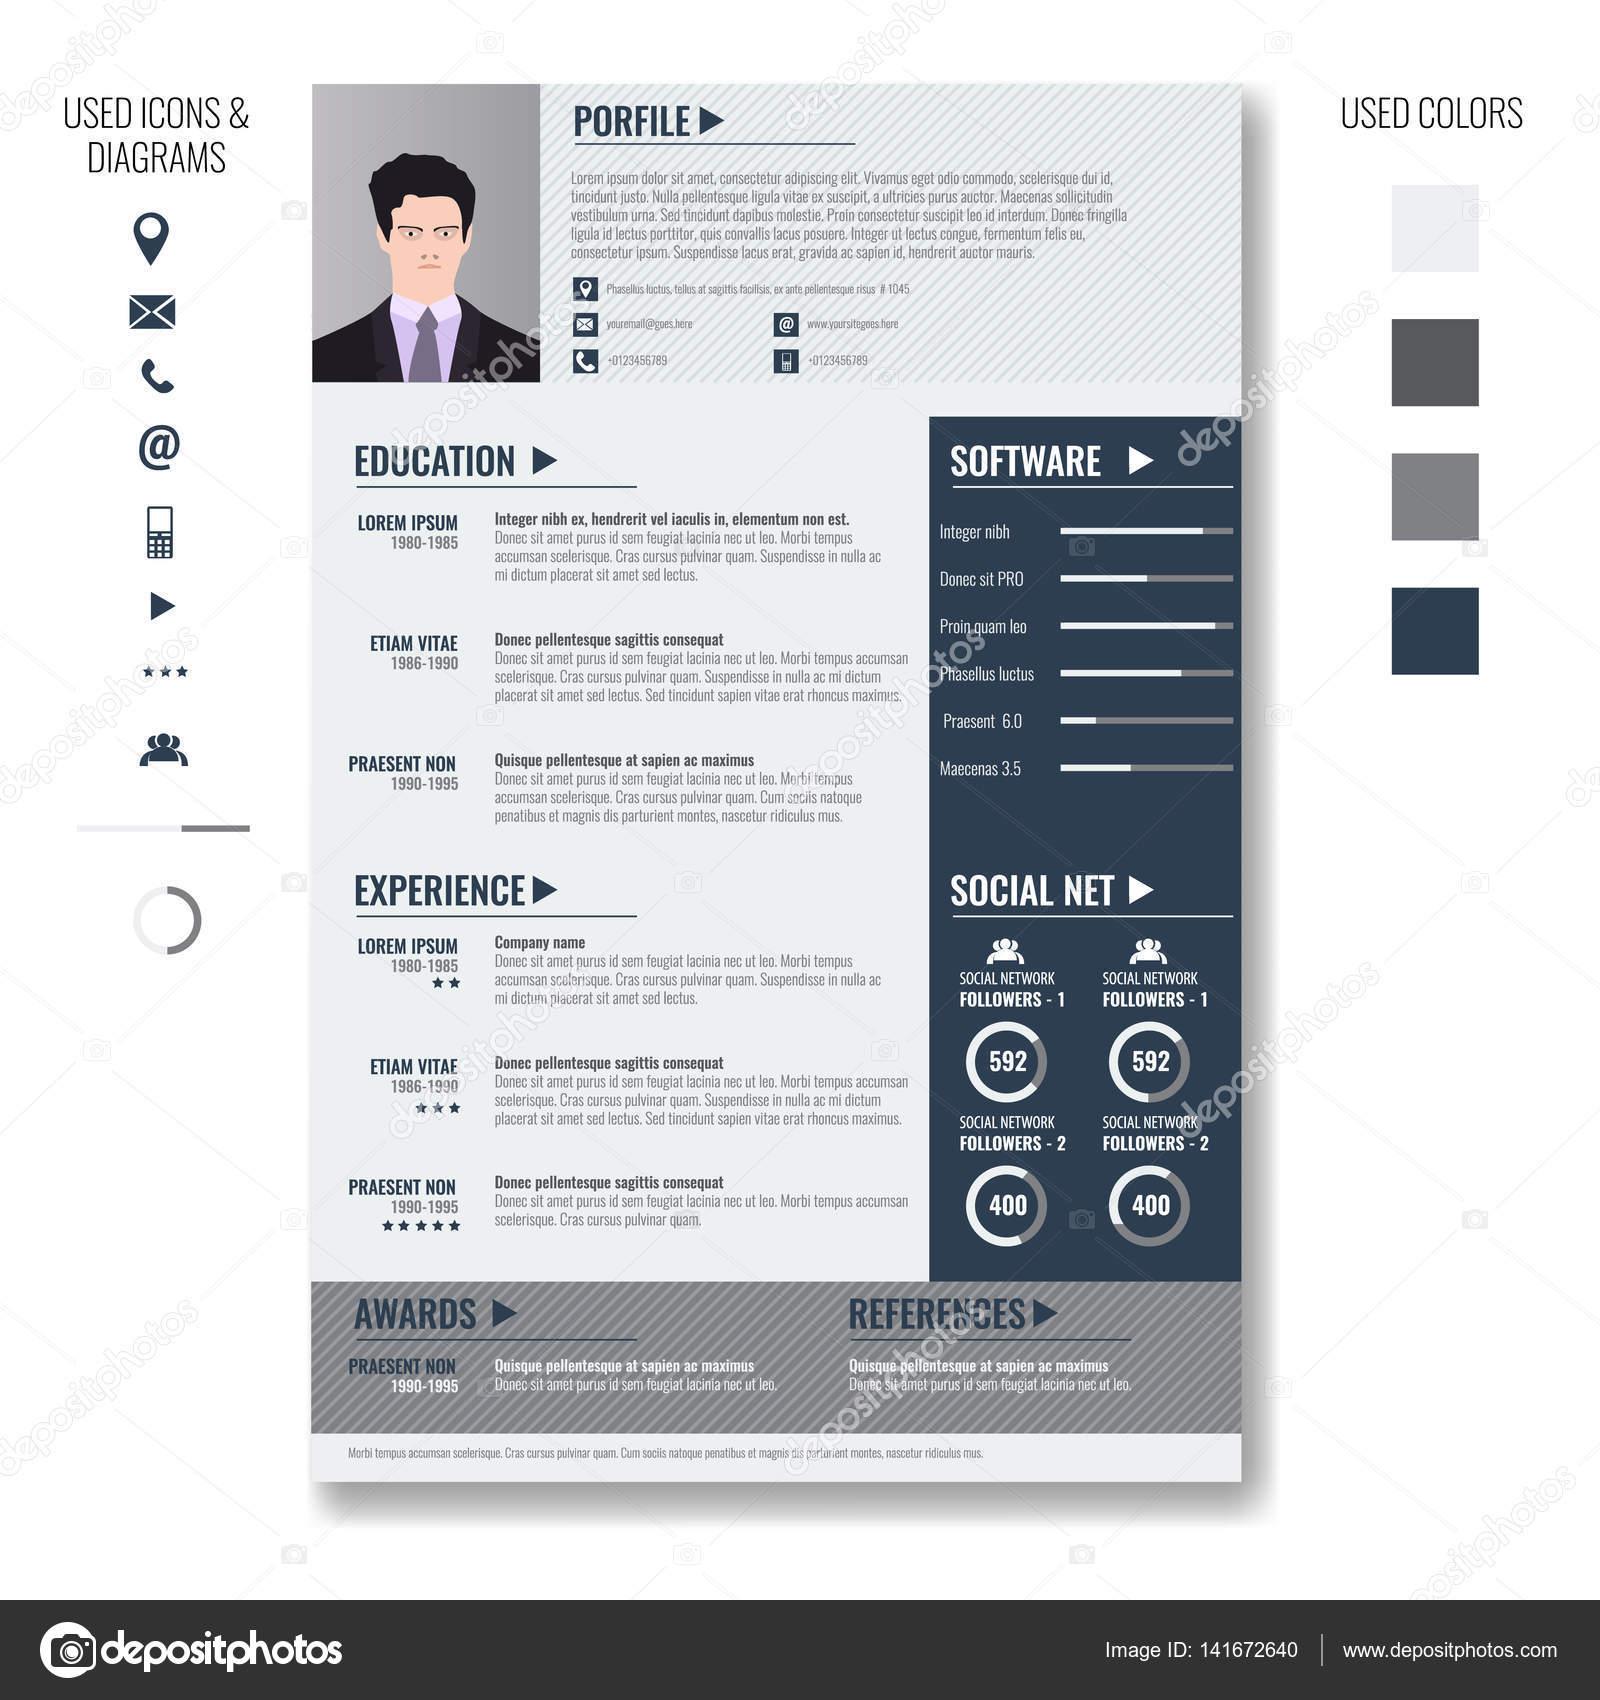 Vektor-kreative minimalistische Lebenslauf Lebenslauf-Vorlage mit ...